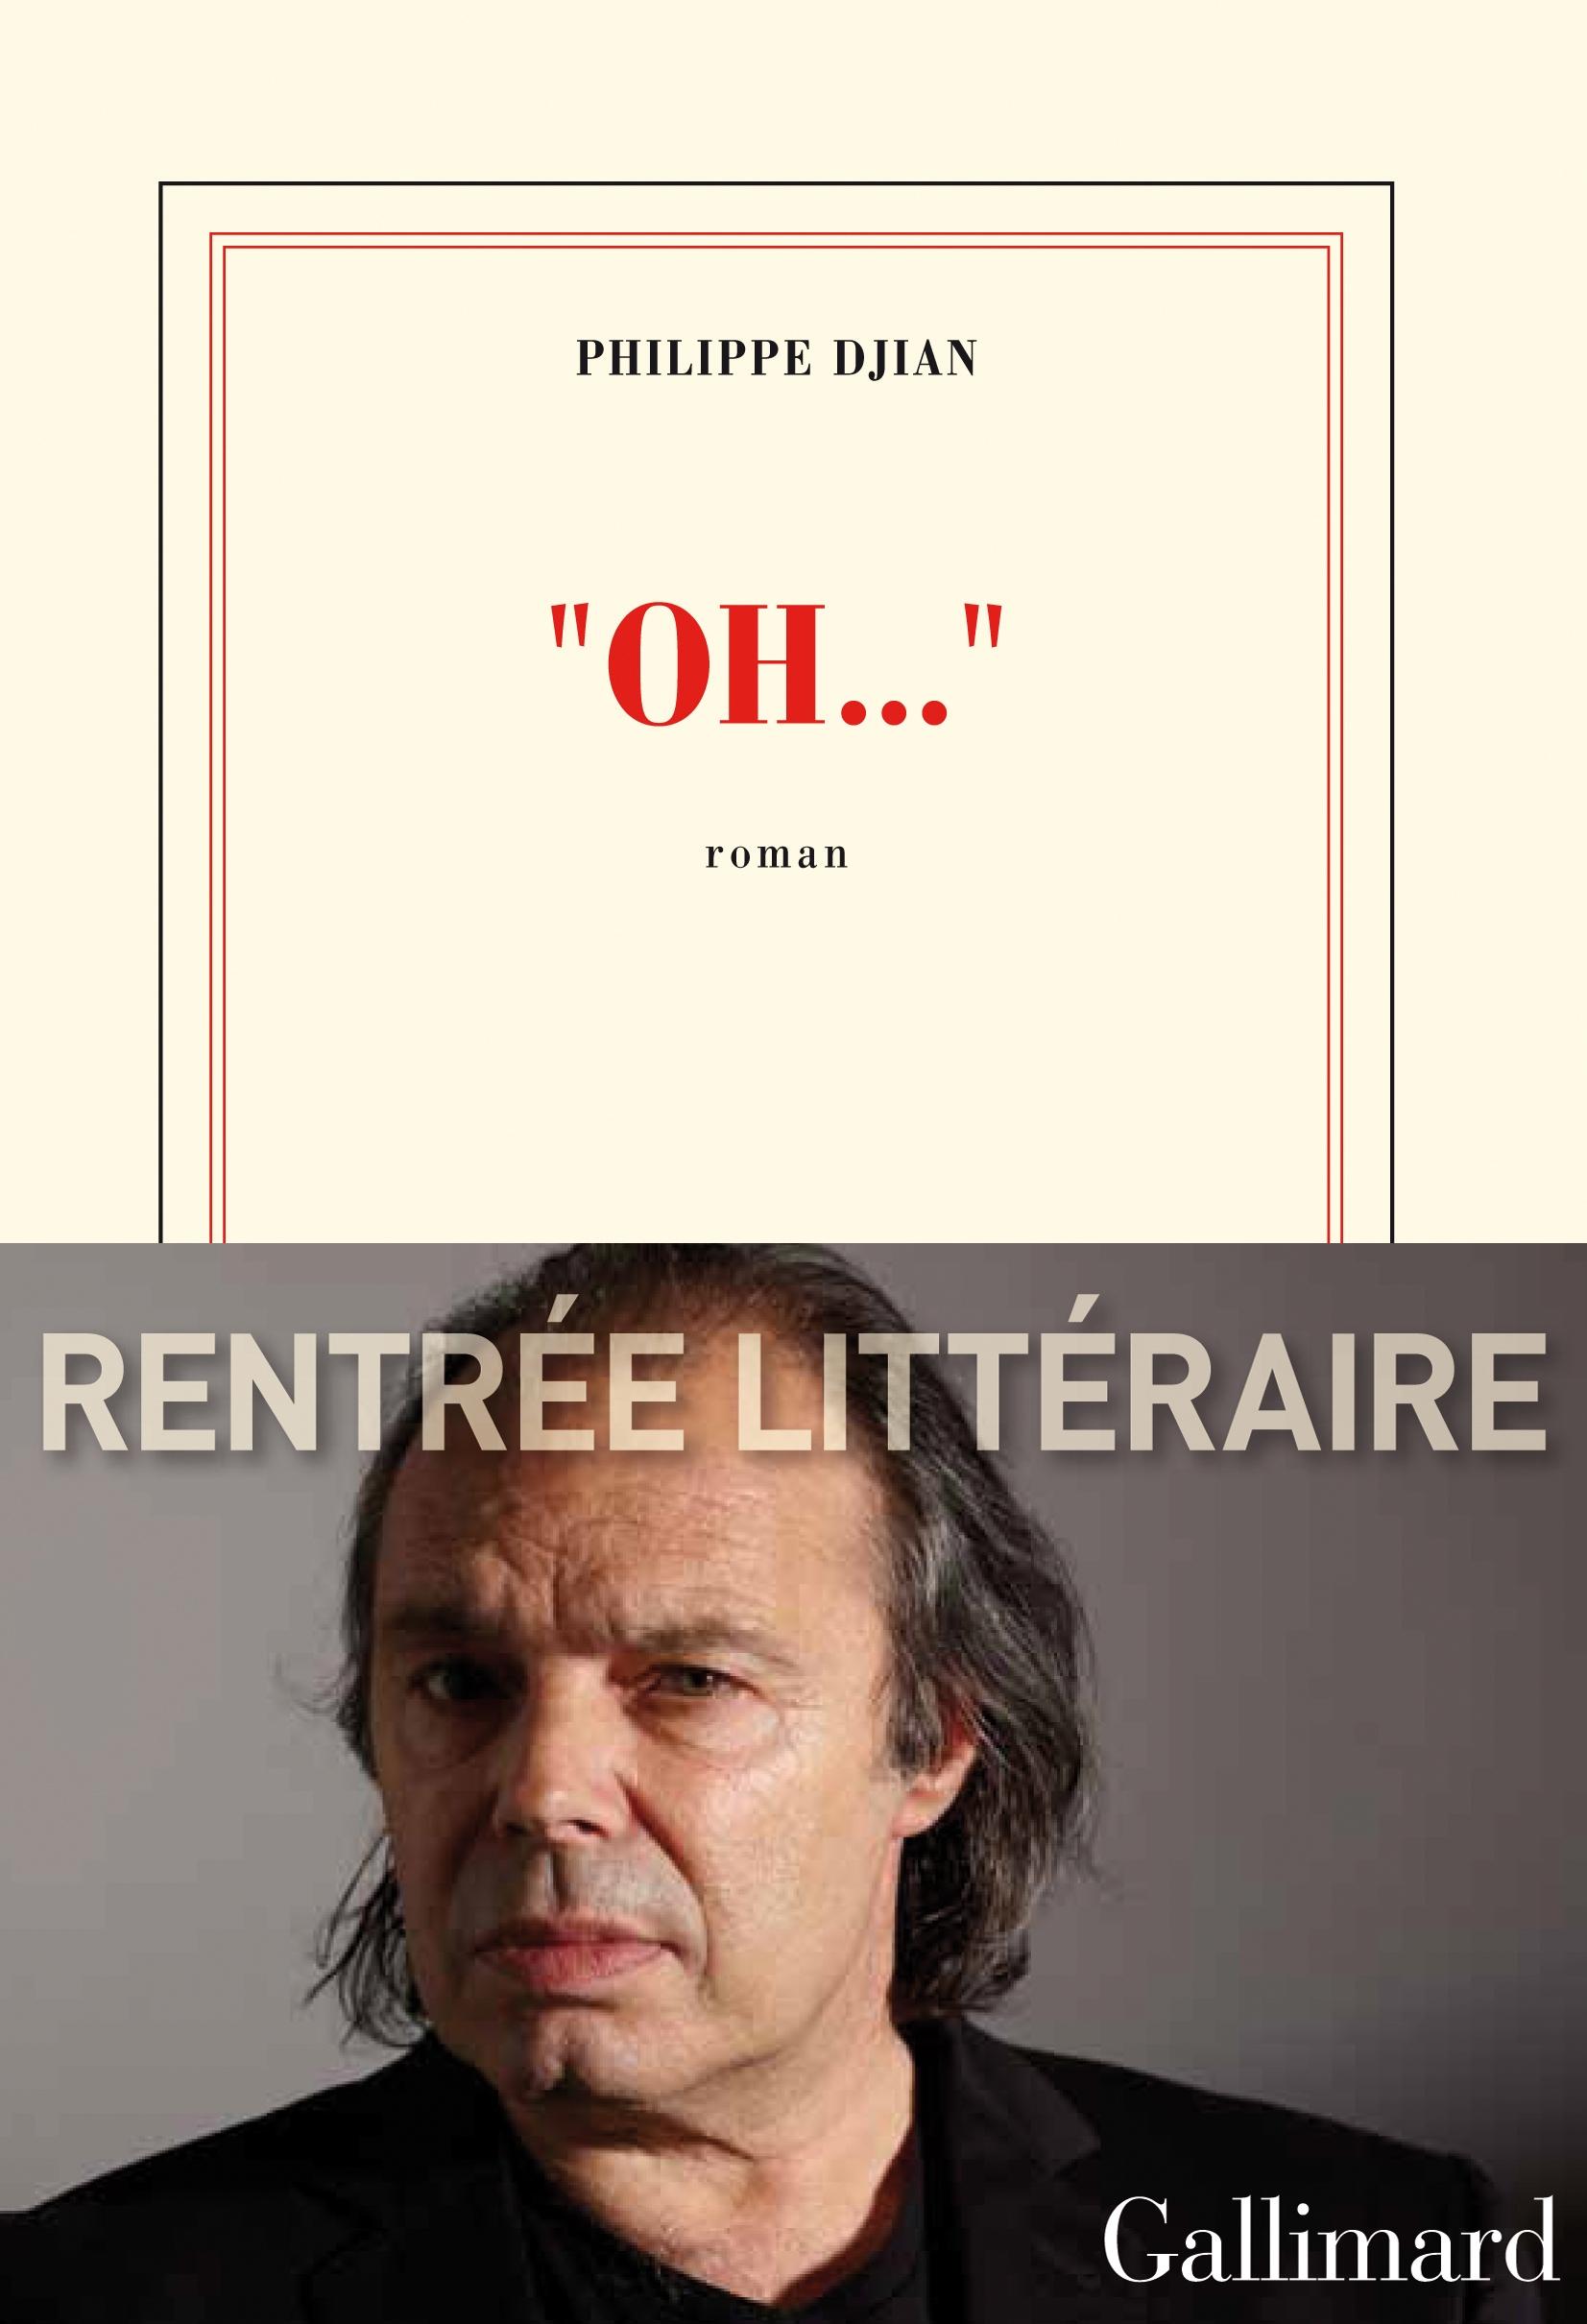 DJIAN-Philippe-COUV-Oh-avec-bande